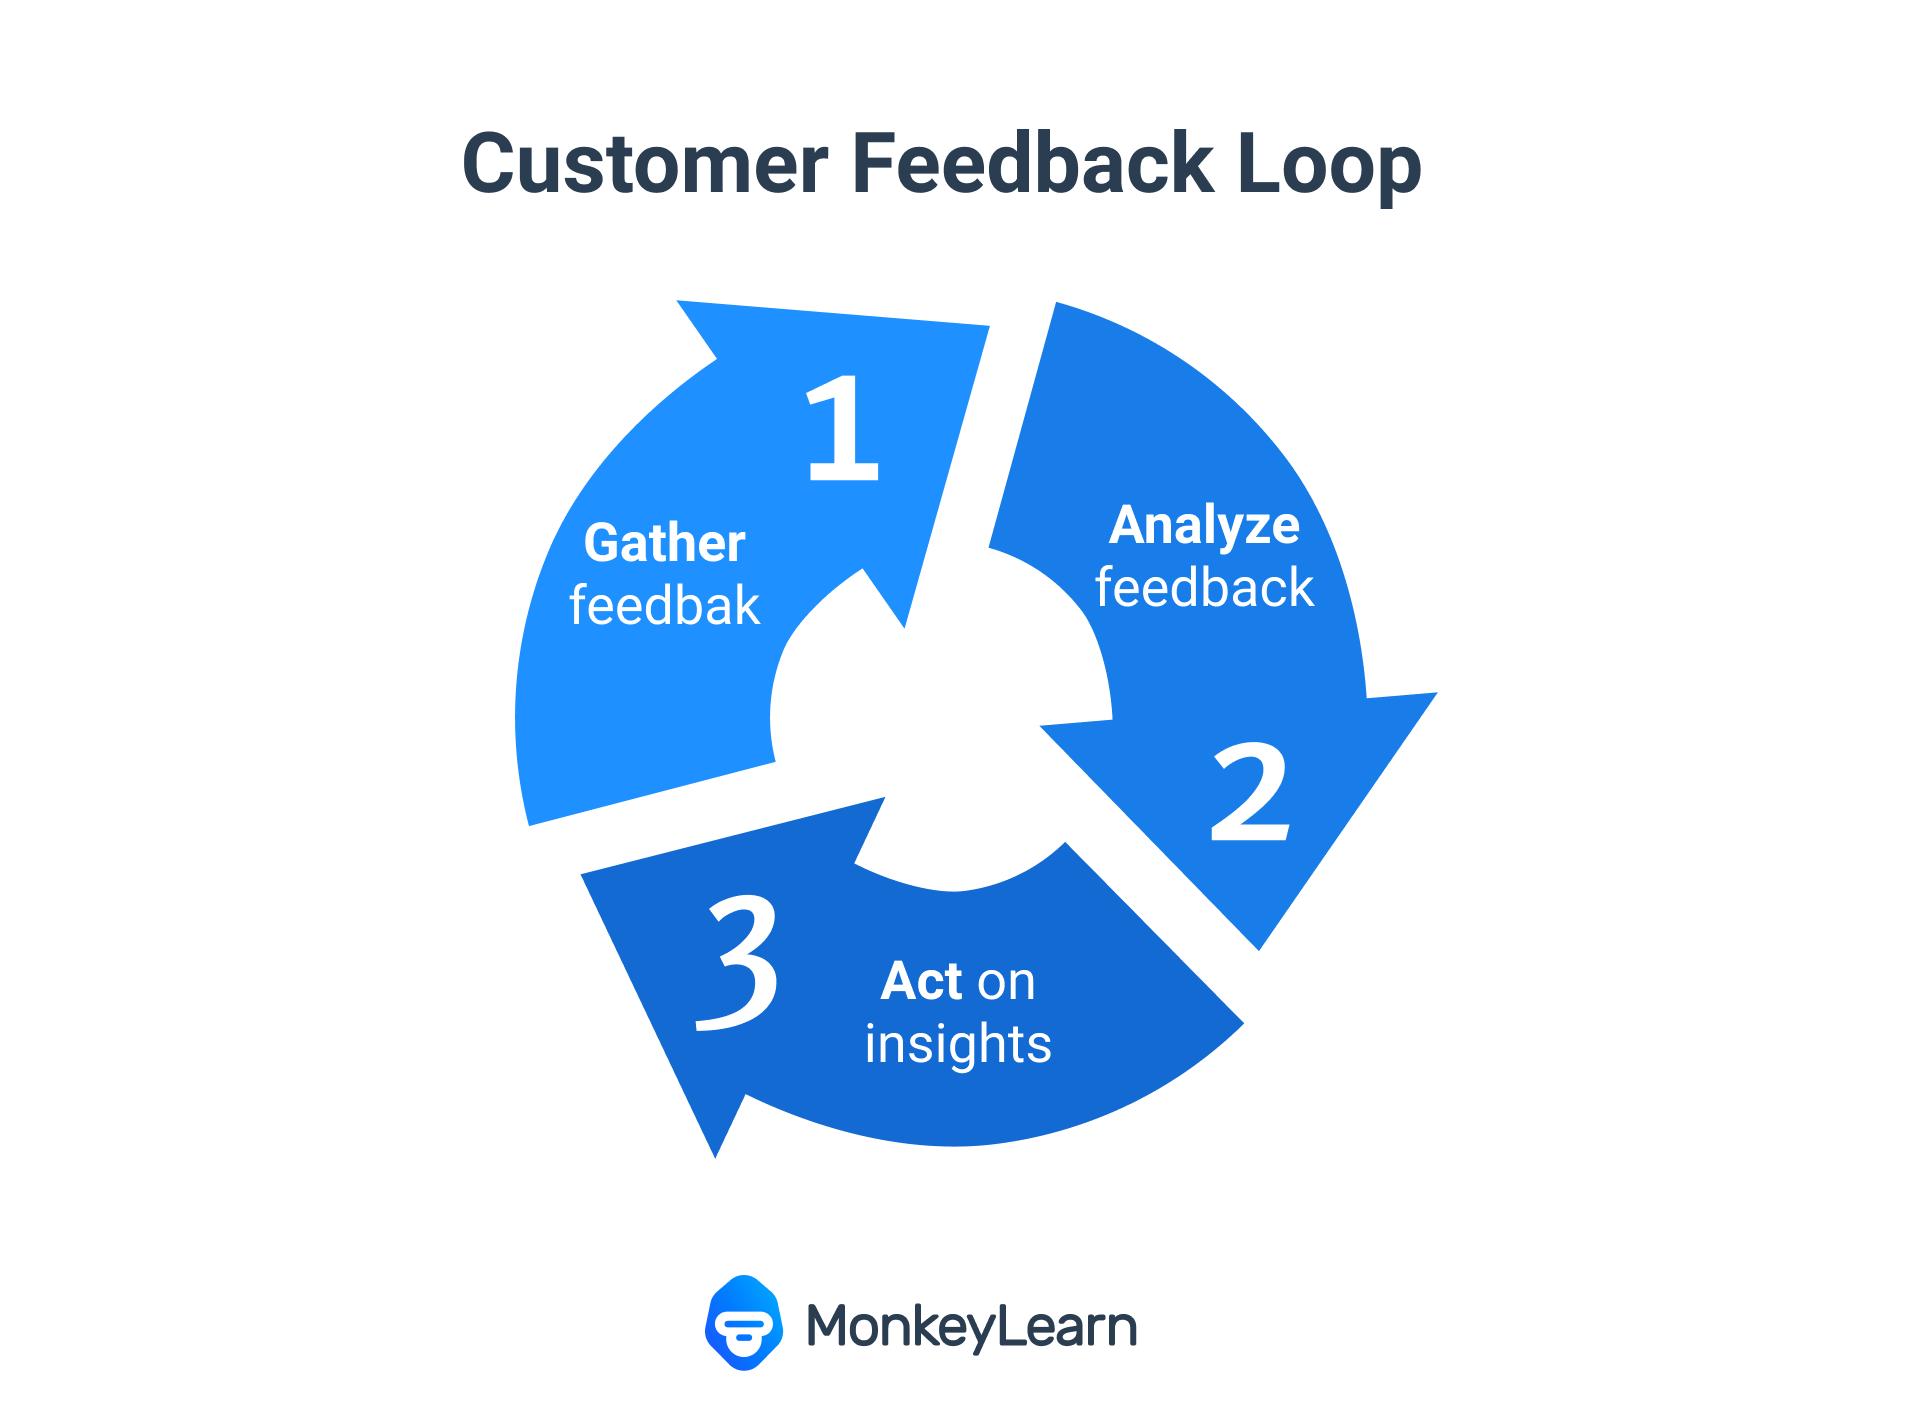 A customer feedback loop flow chart: 'Gather,' 'Analyze,' 'Act on it.'